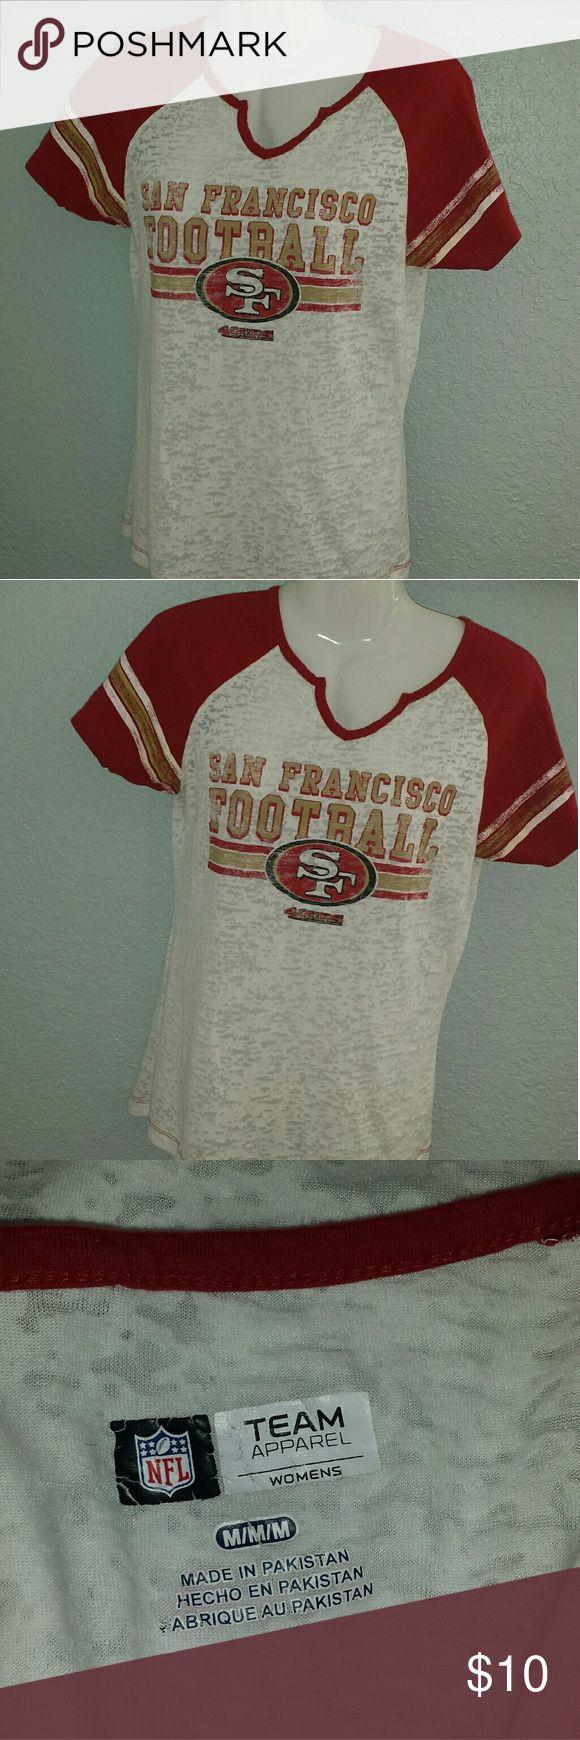 NFL  ladies Football  T Shirt San Francisco NFL football shirt. Womens  M. Gently used condition. Nfl team apparel Tops Tees - Short Sleeve